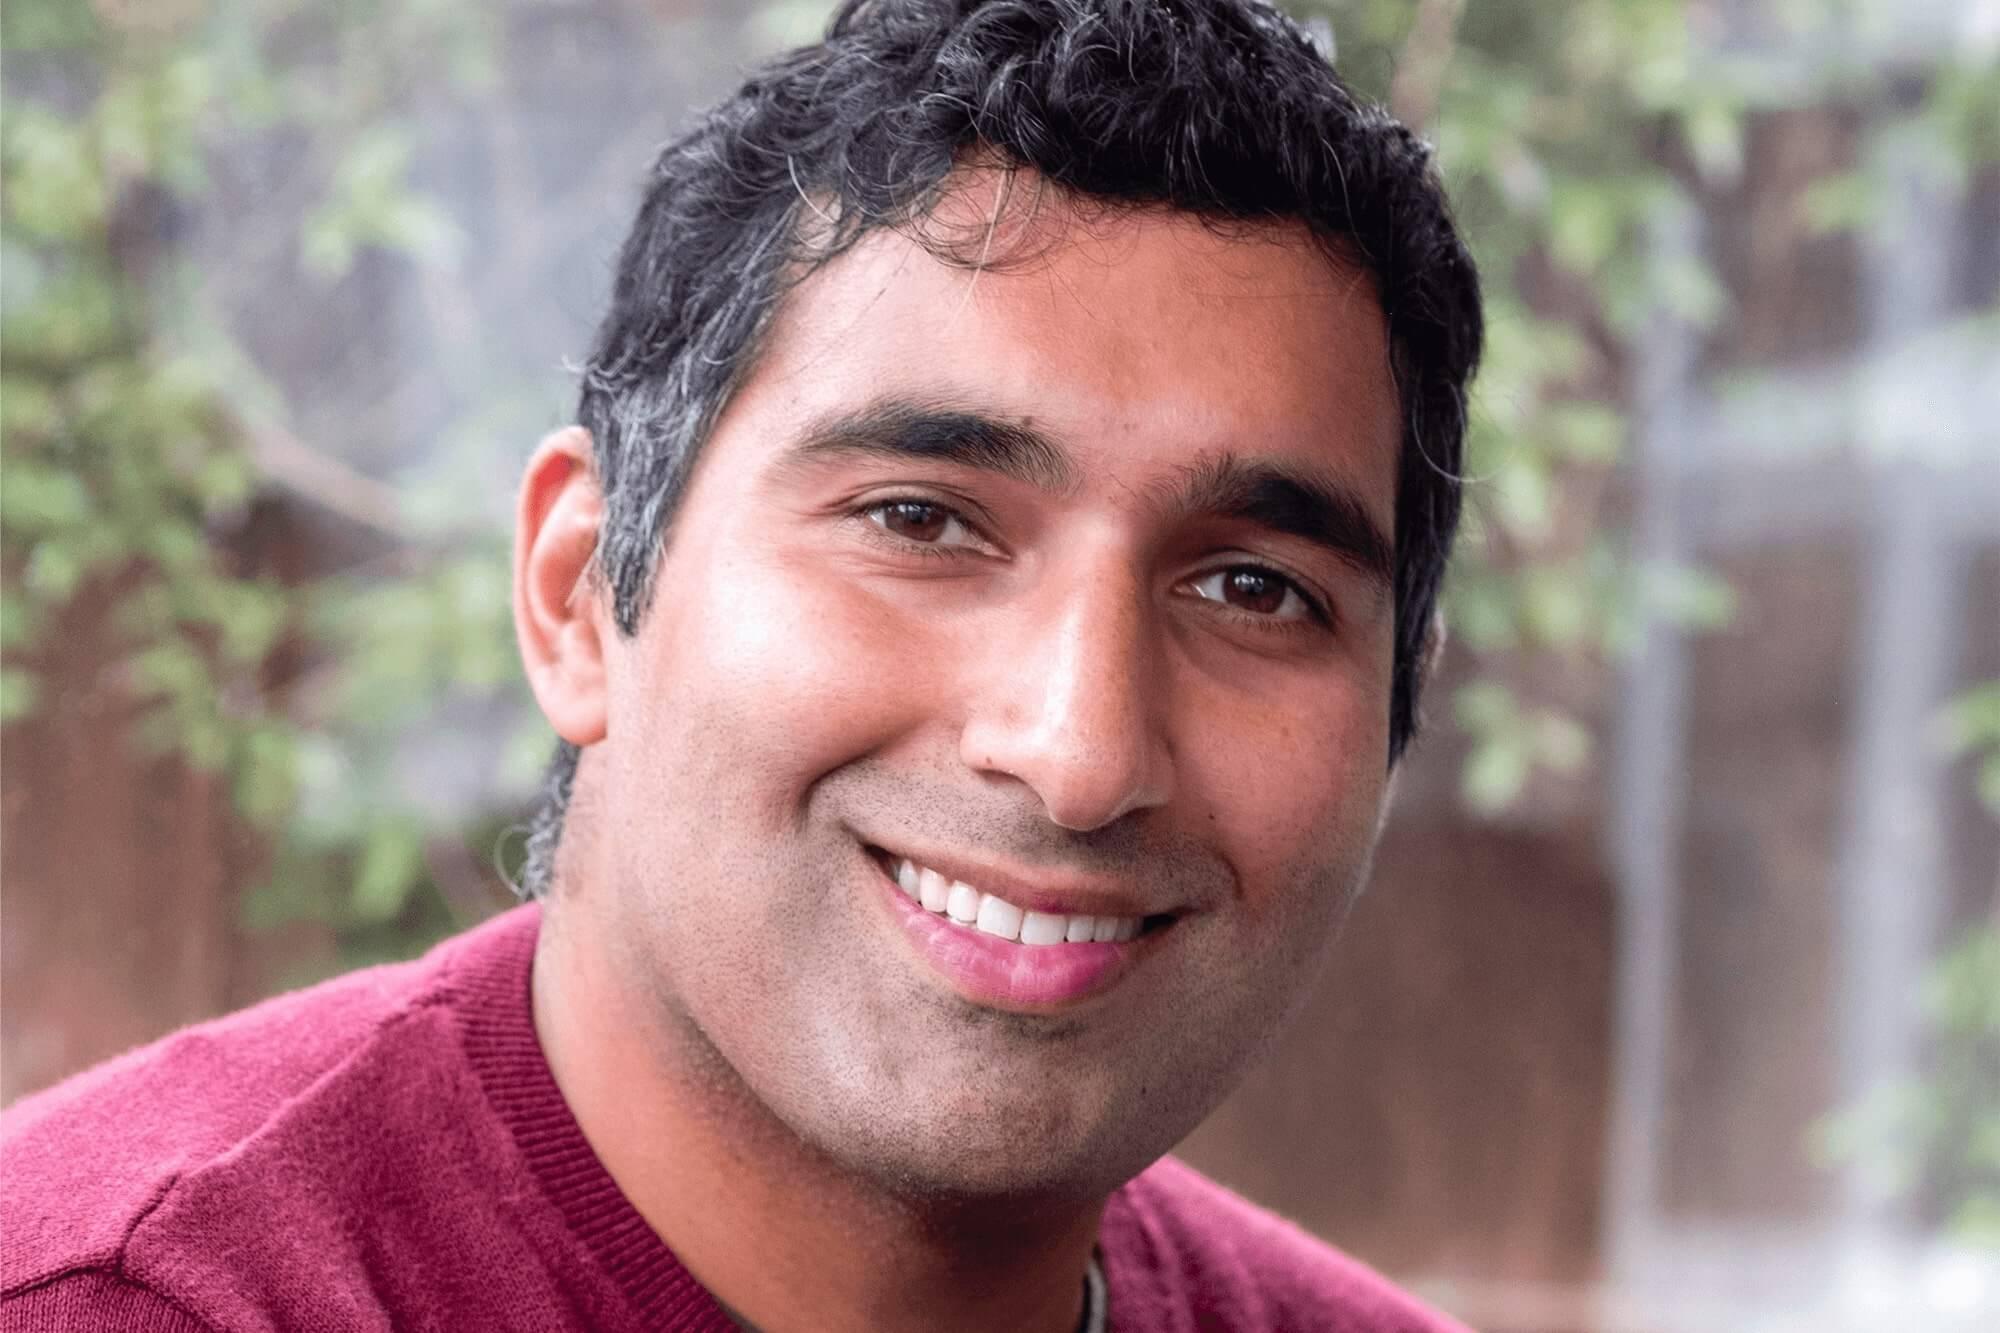 A portrait picture of Baasit Siddiqui